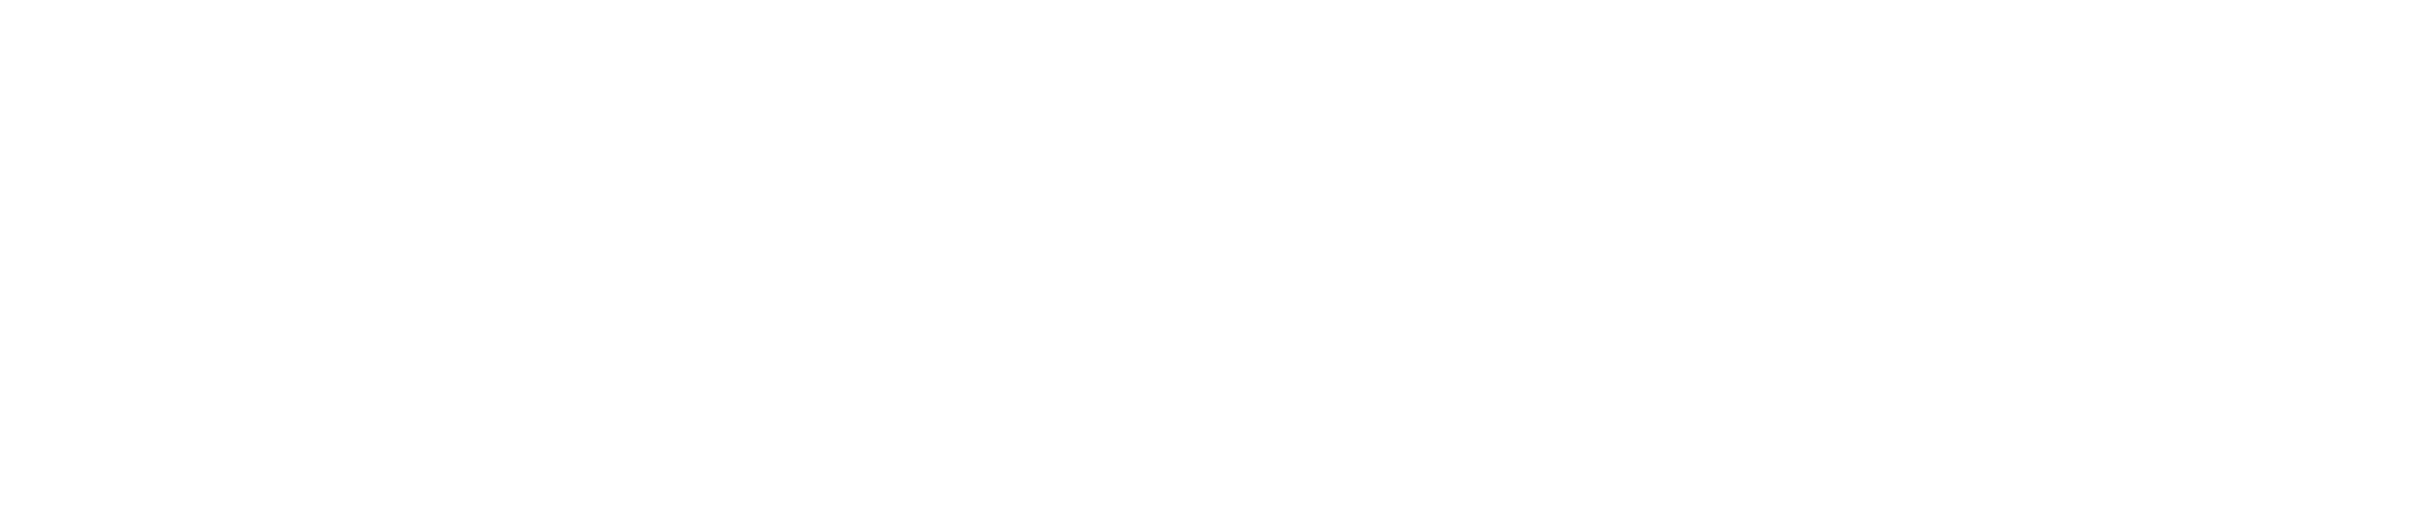 sharp-logo-black-and-white copy